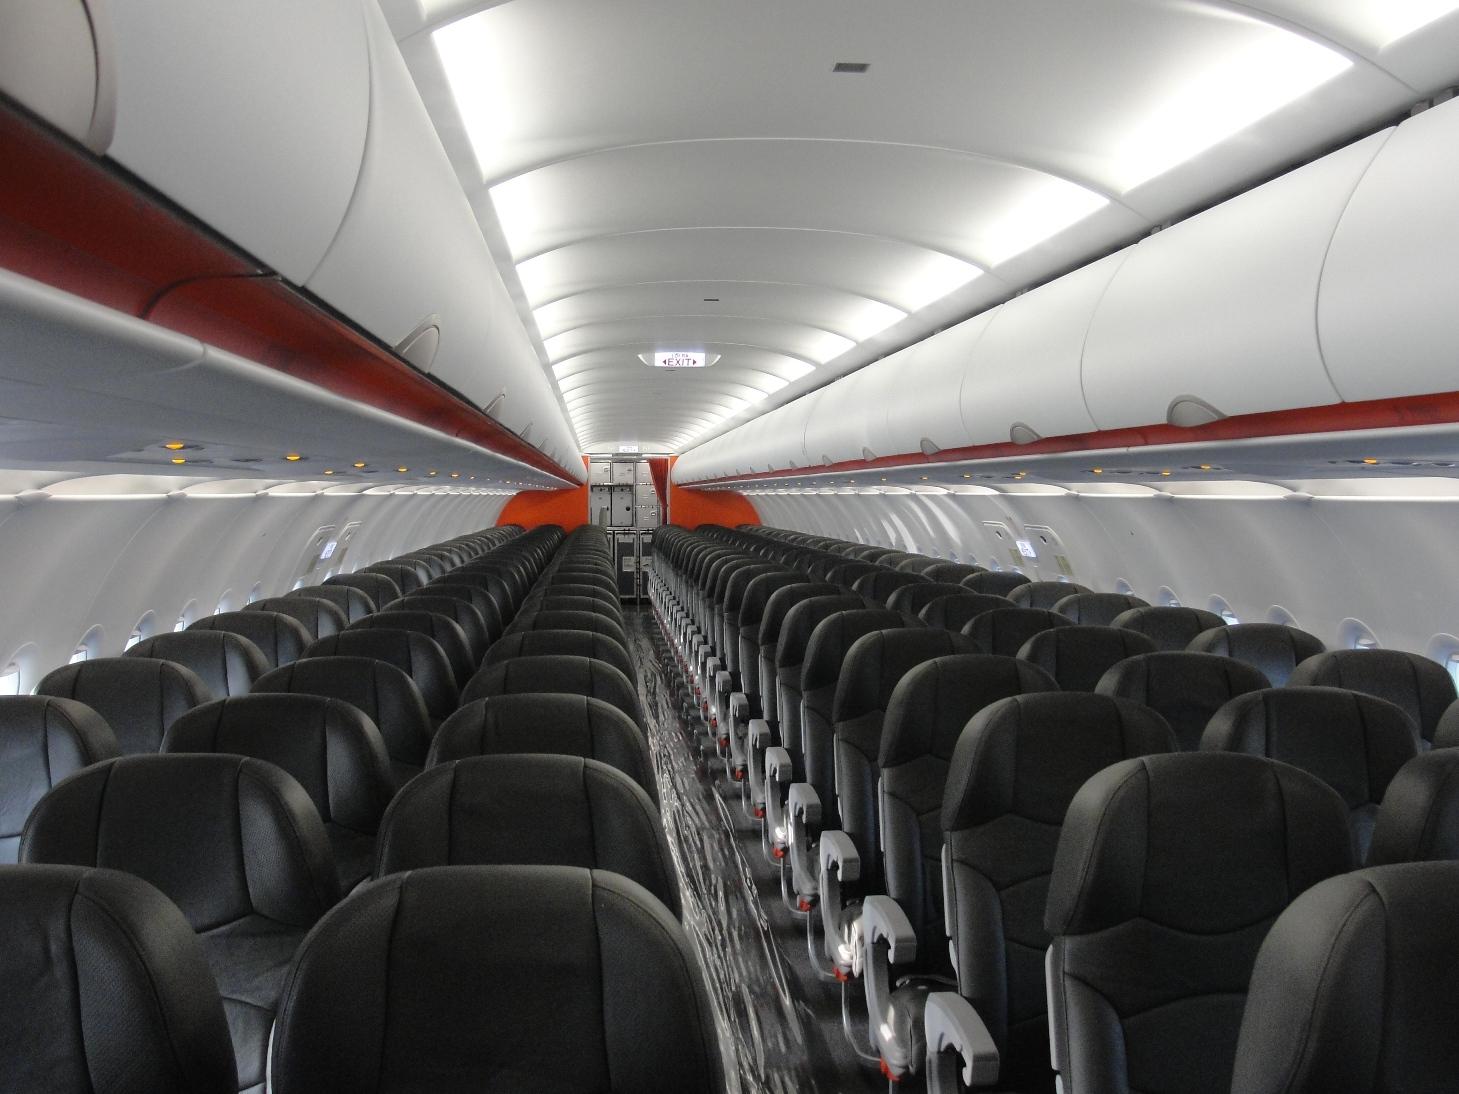 ... máy bay Airbus A320 của Jetstar Pacific.jpg - Wikimedia Commons